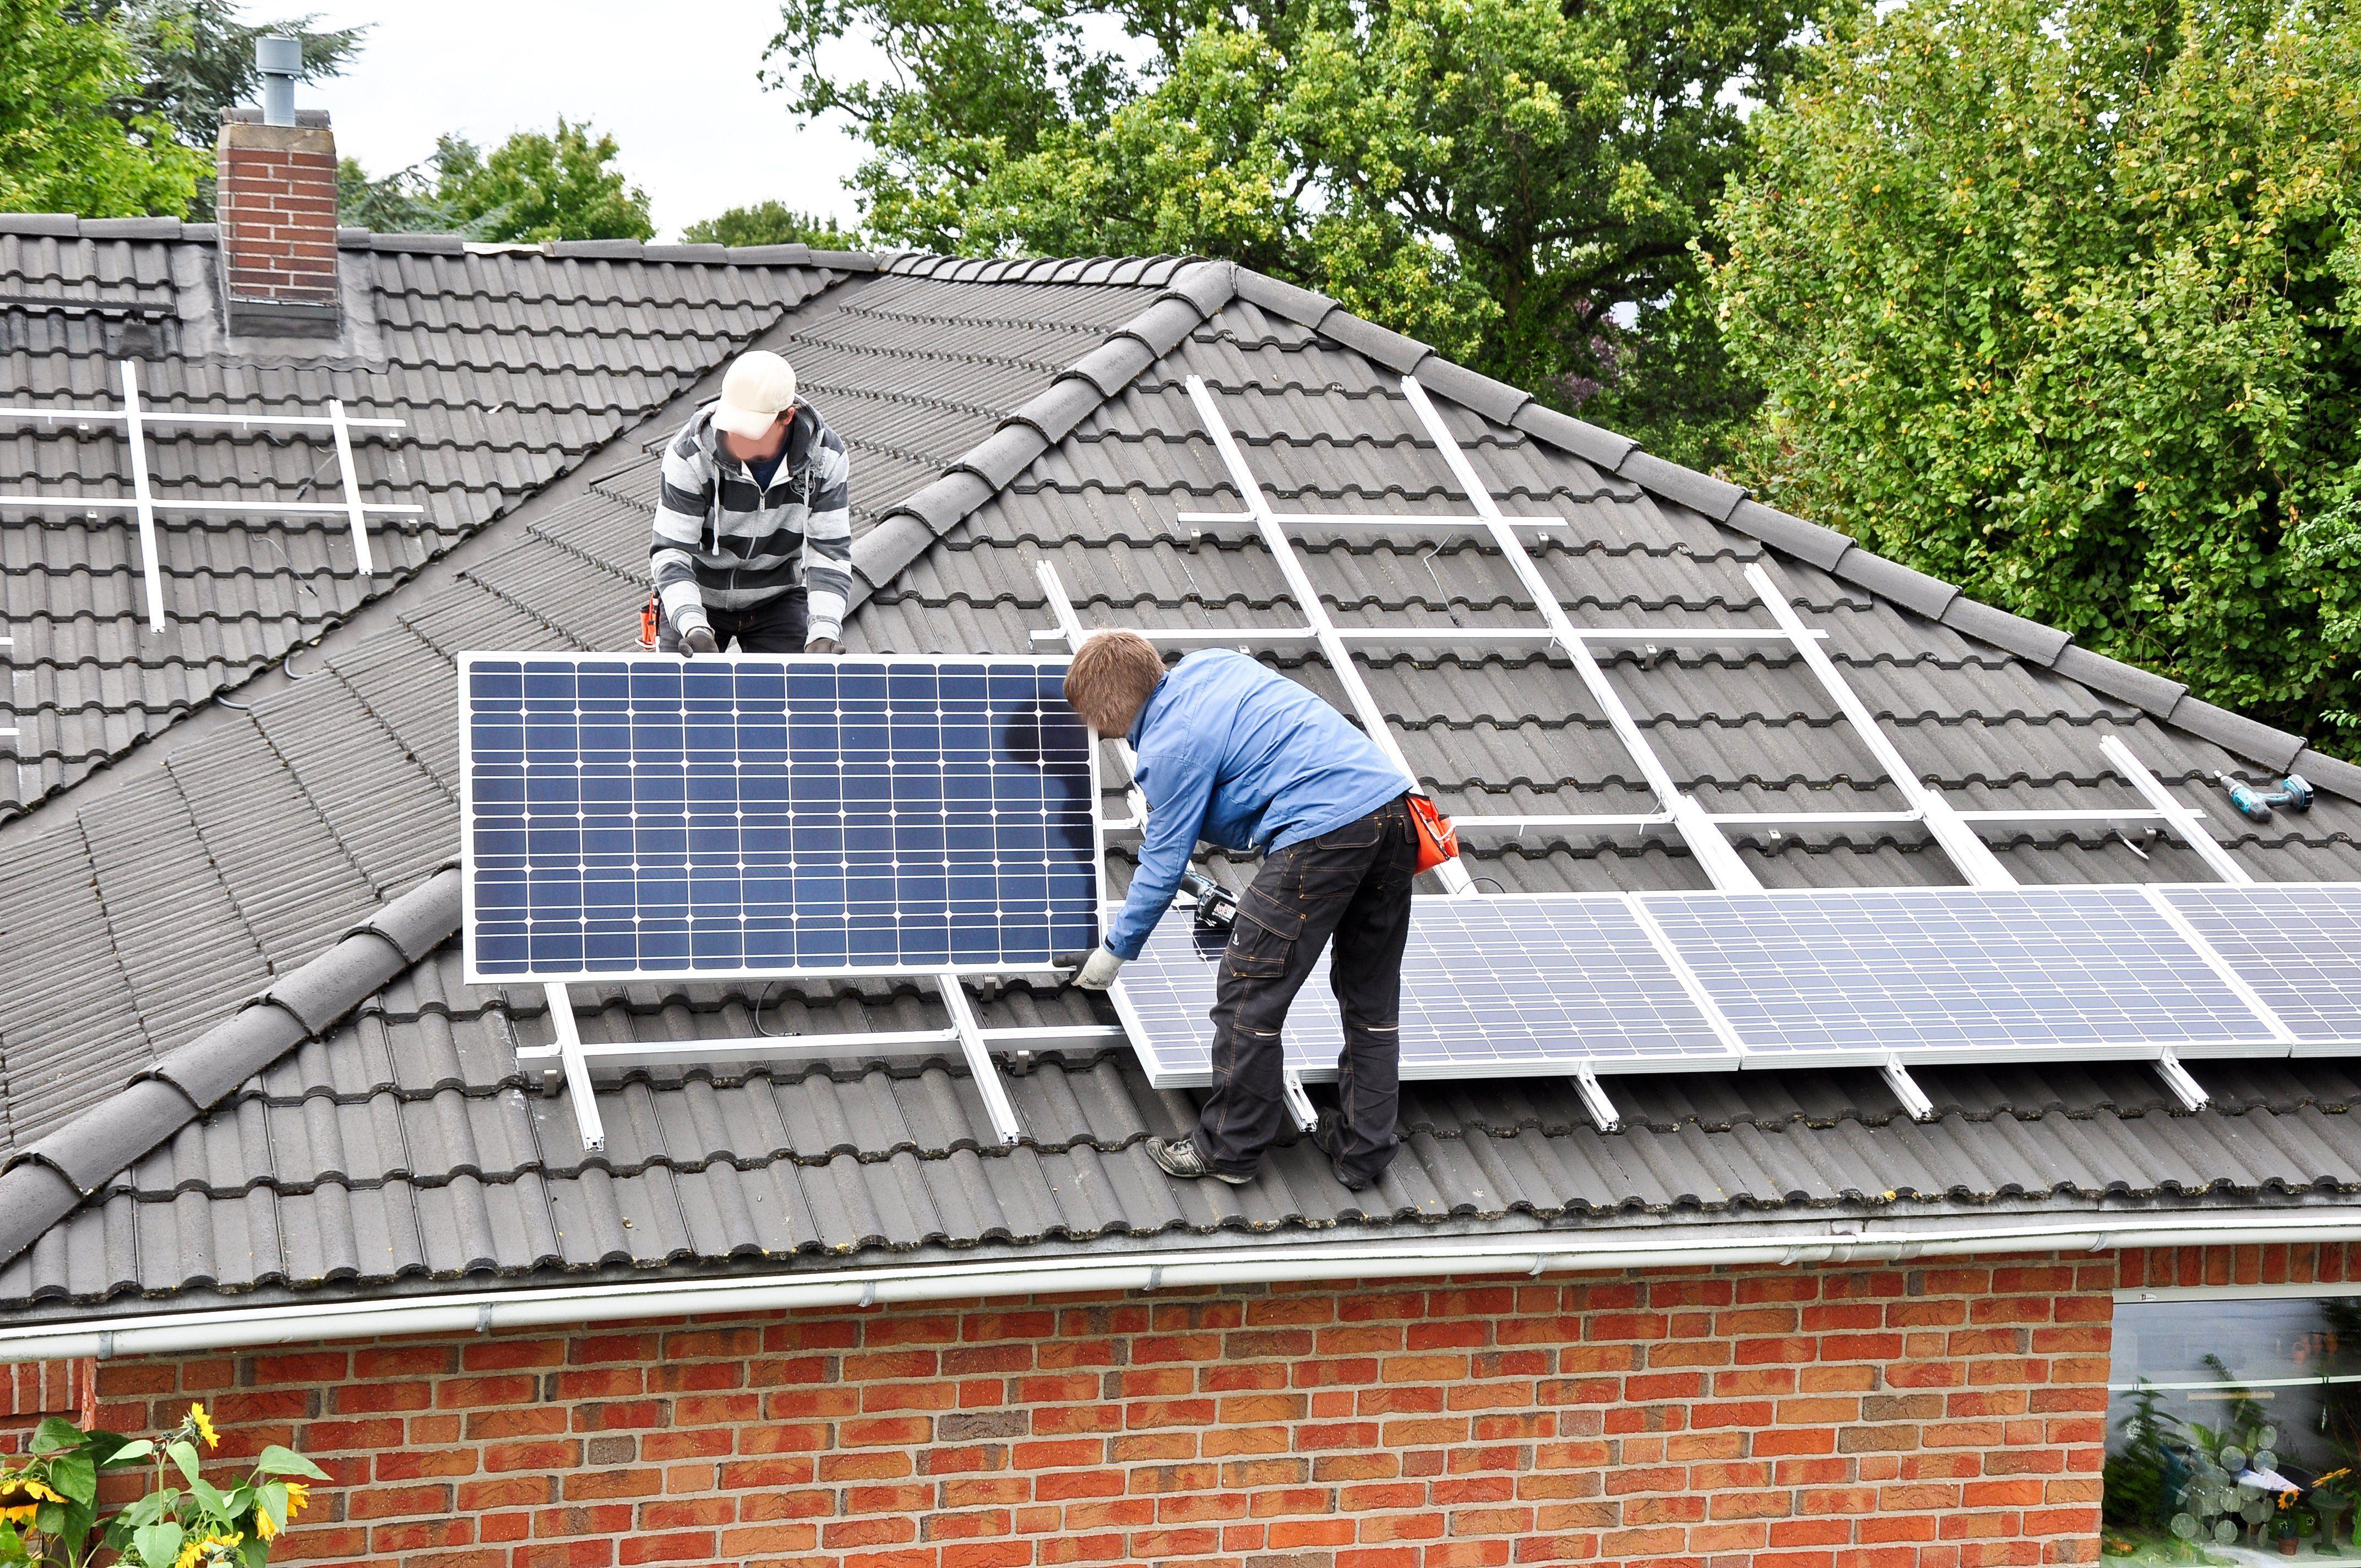 Snickers reccomend Solar panel jokes